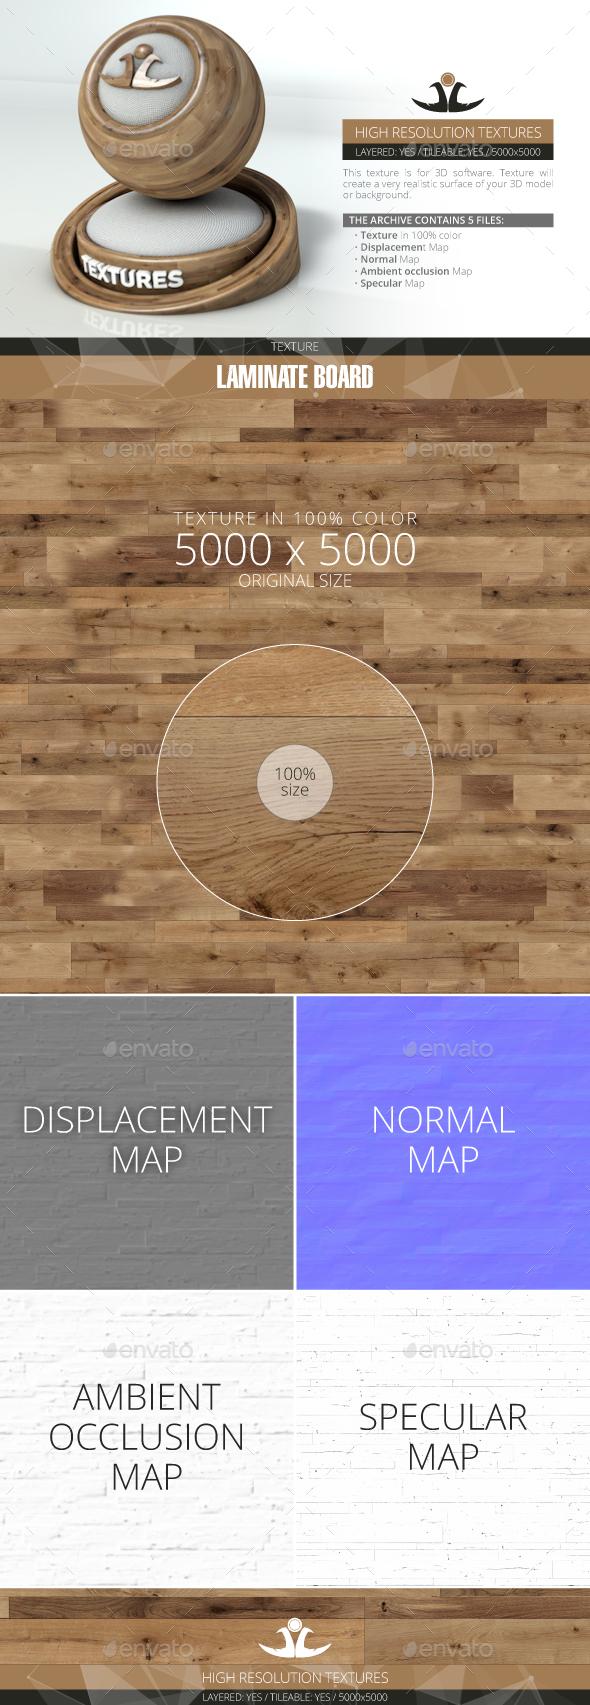 Laminate Board 34 - 3DOcean Item for Sale